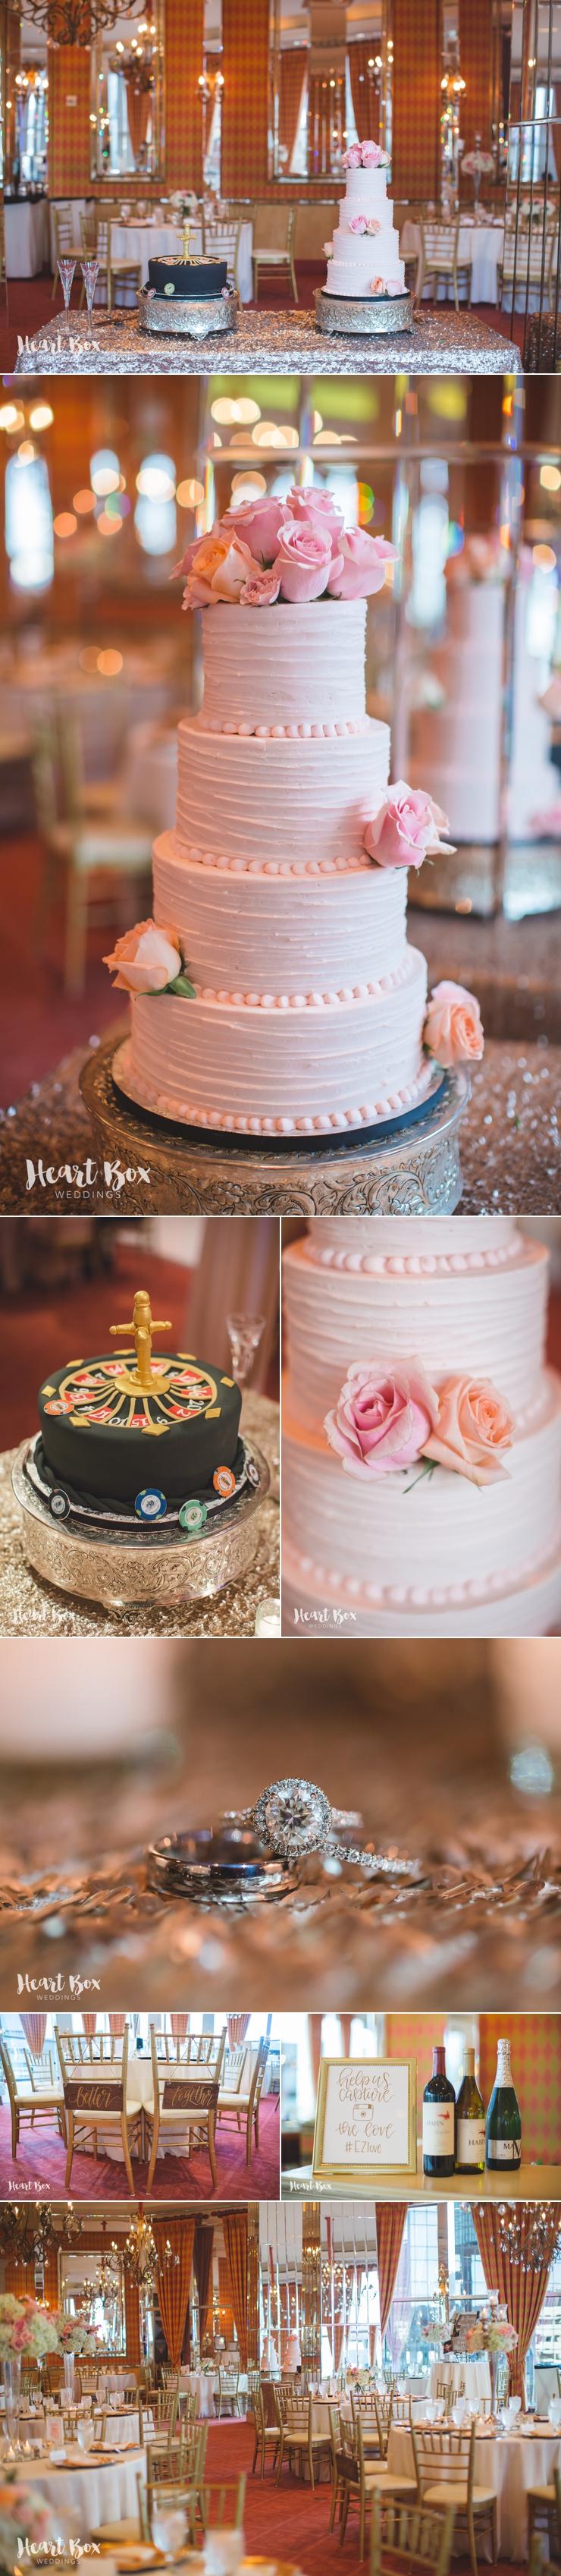 Smith Wedding Blog Collages 10.jpg